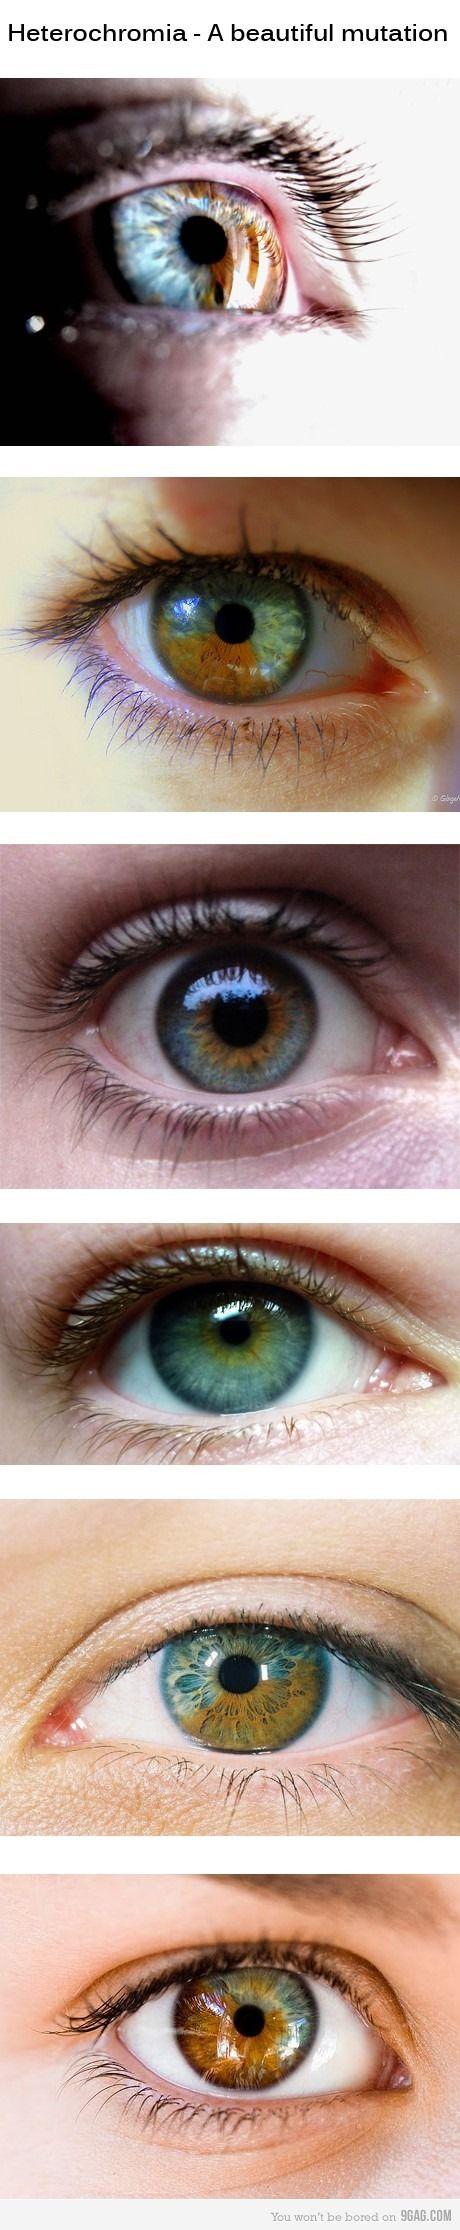 Heterochromia - a beautiful mutation of the iris #ravenectar #microscope #upclose #beautiful #patterns #intricate #micro